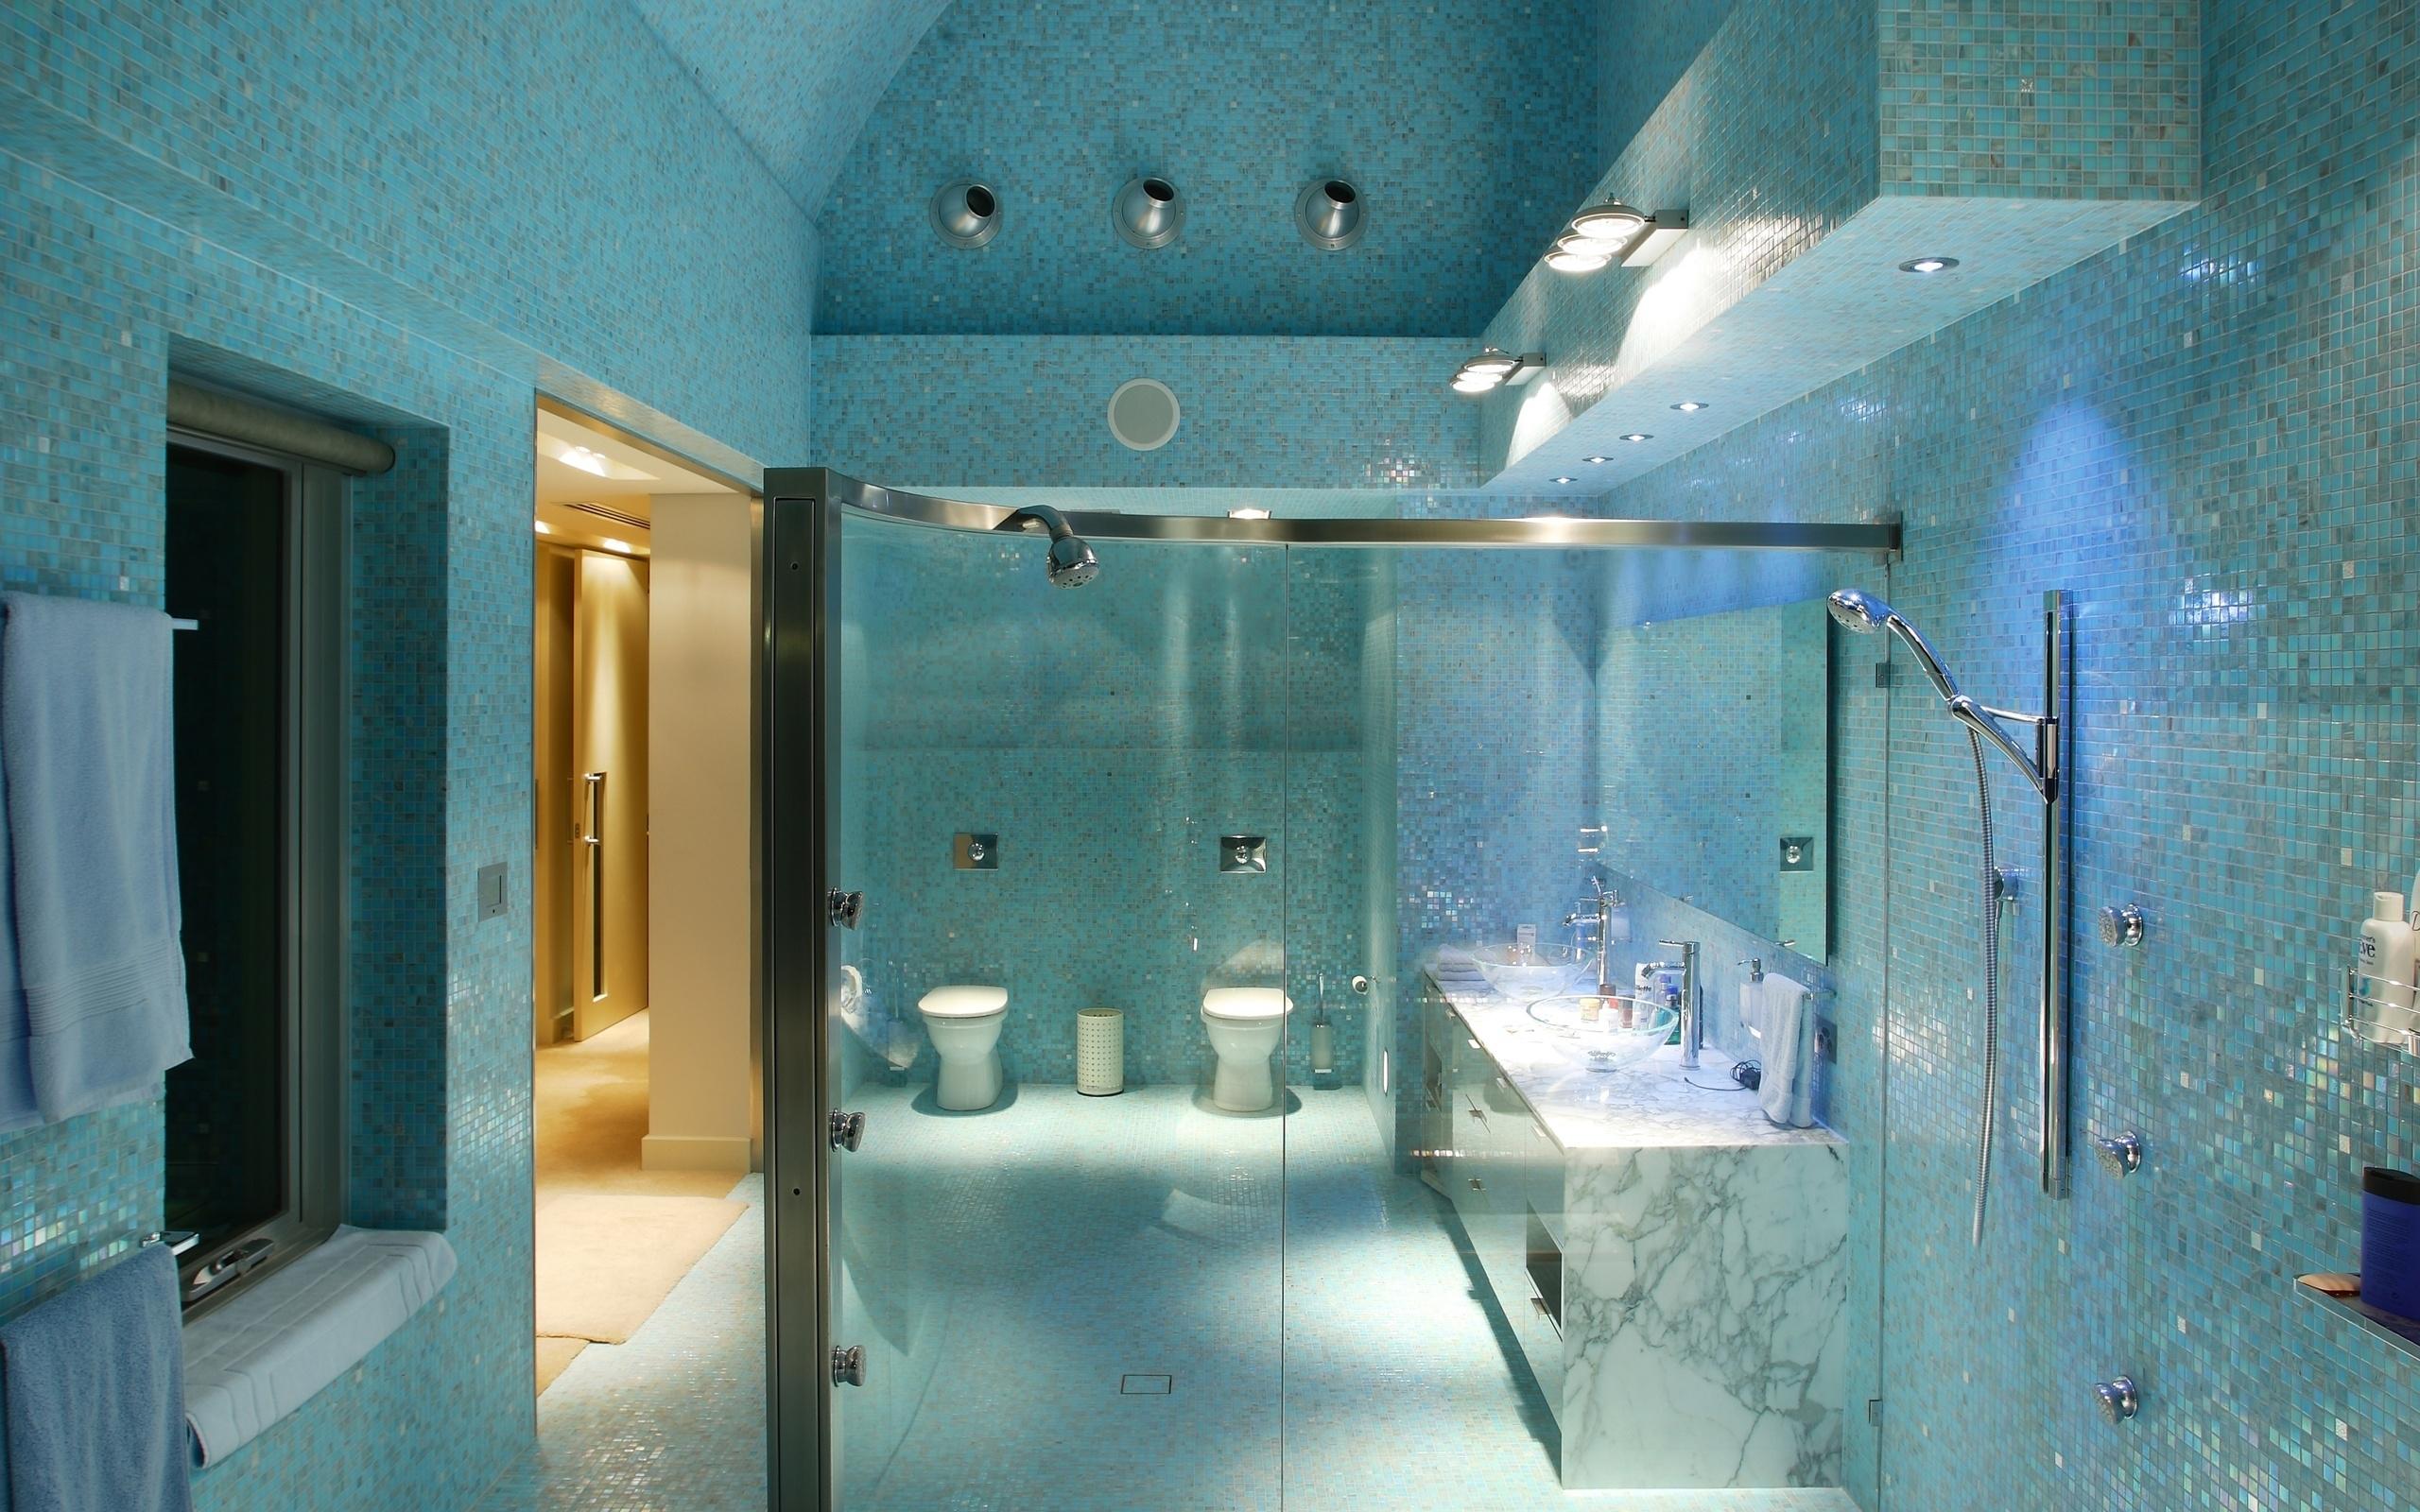 Wallpaper Room Bathroom Wall Style Interior 2560x1600 4kwallpaper 1043249 Hd Wallpapers Wallhere